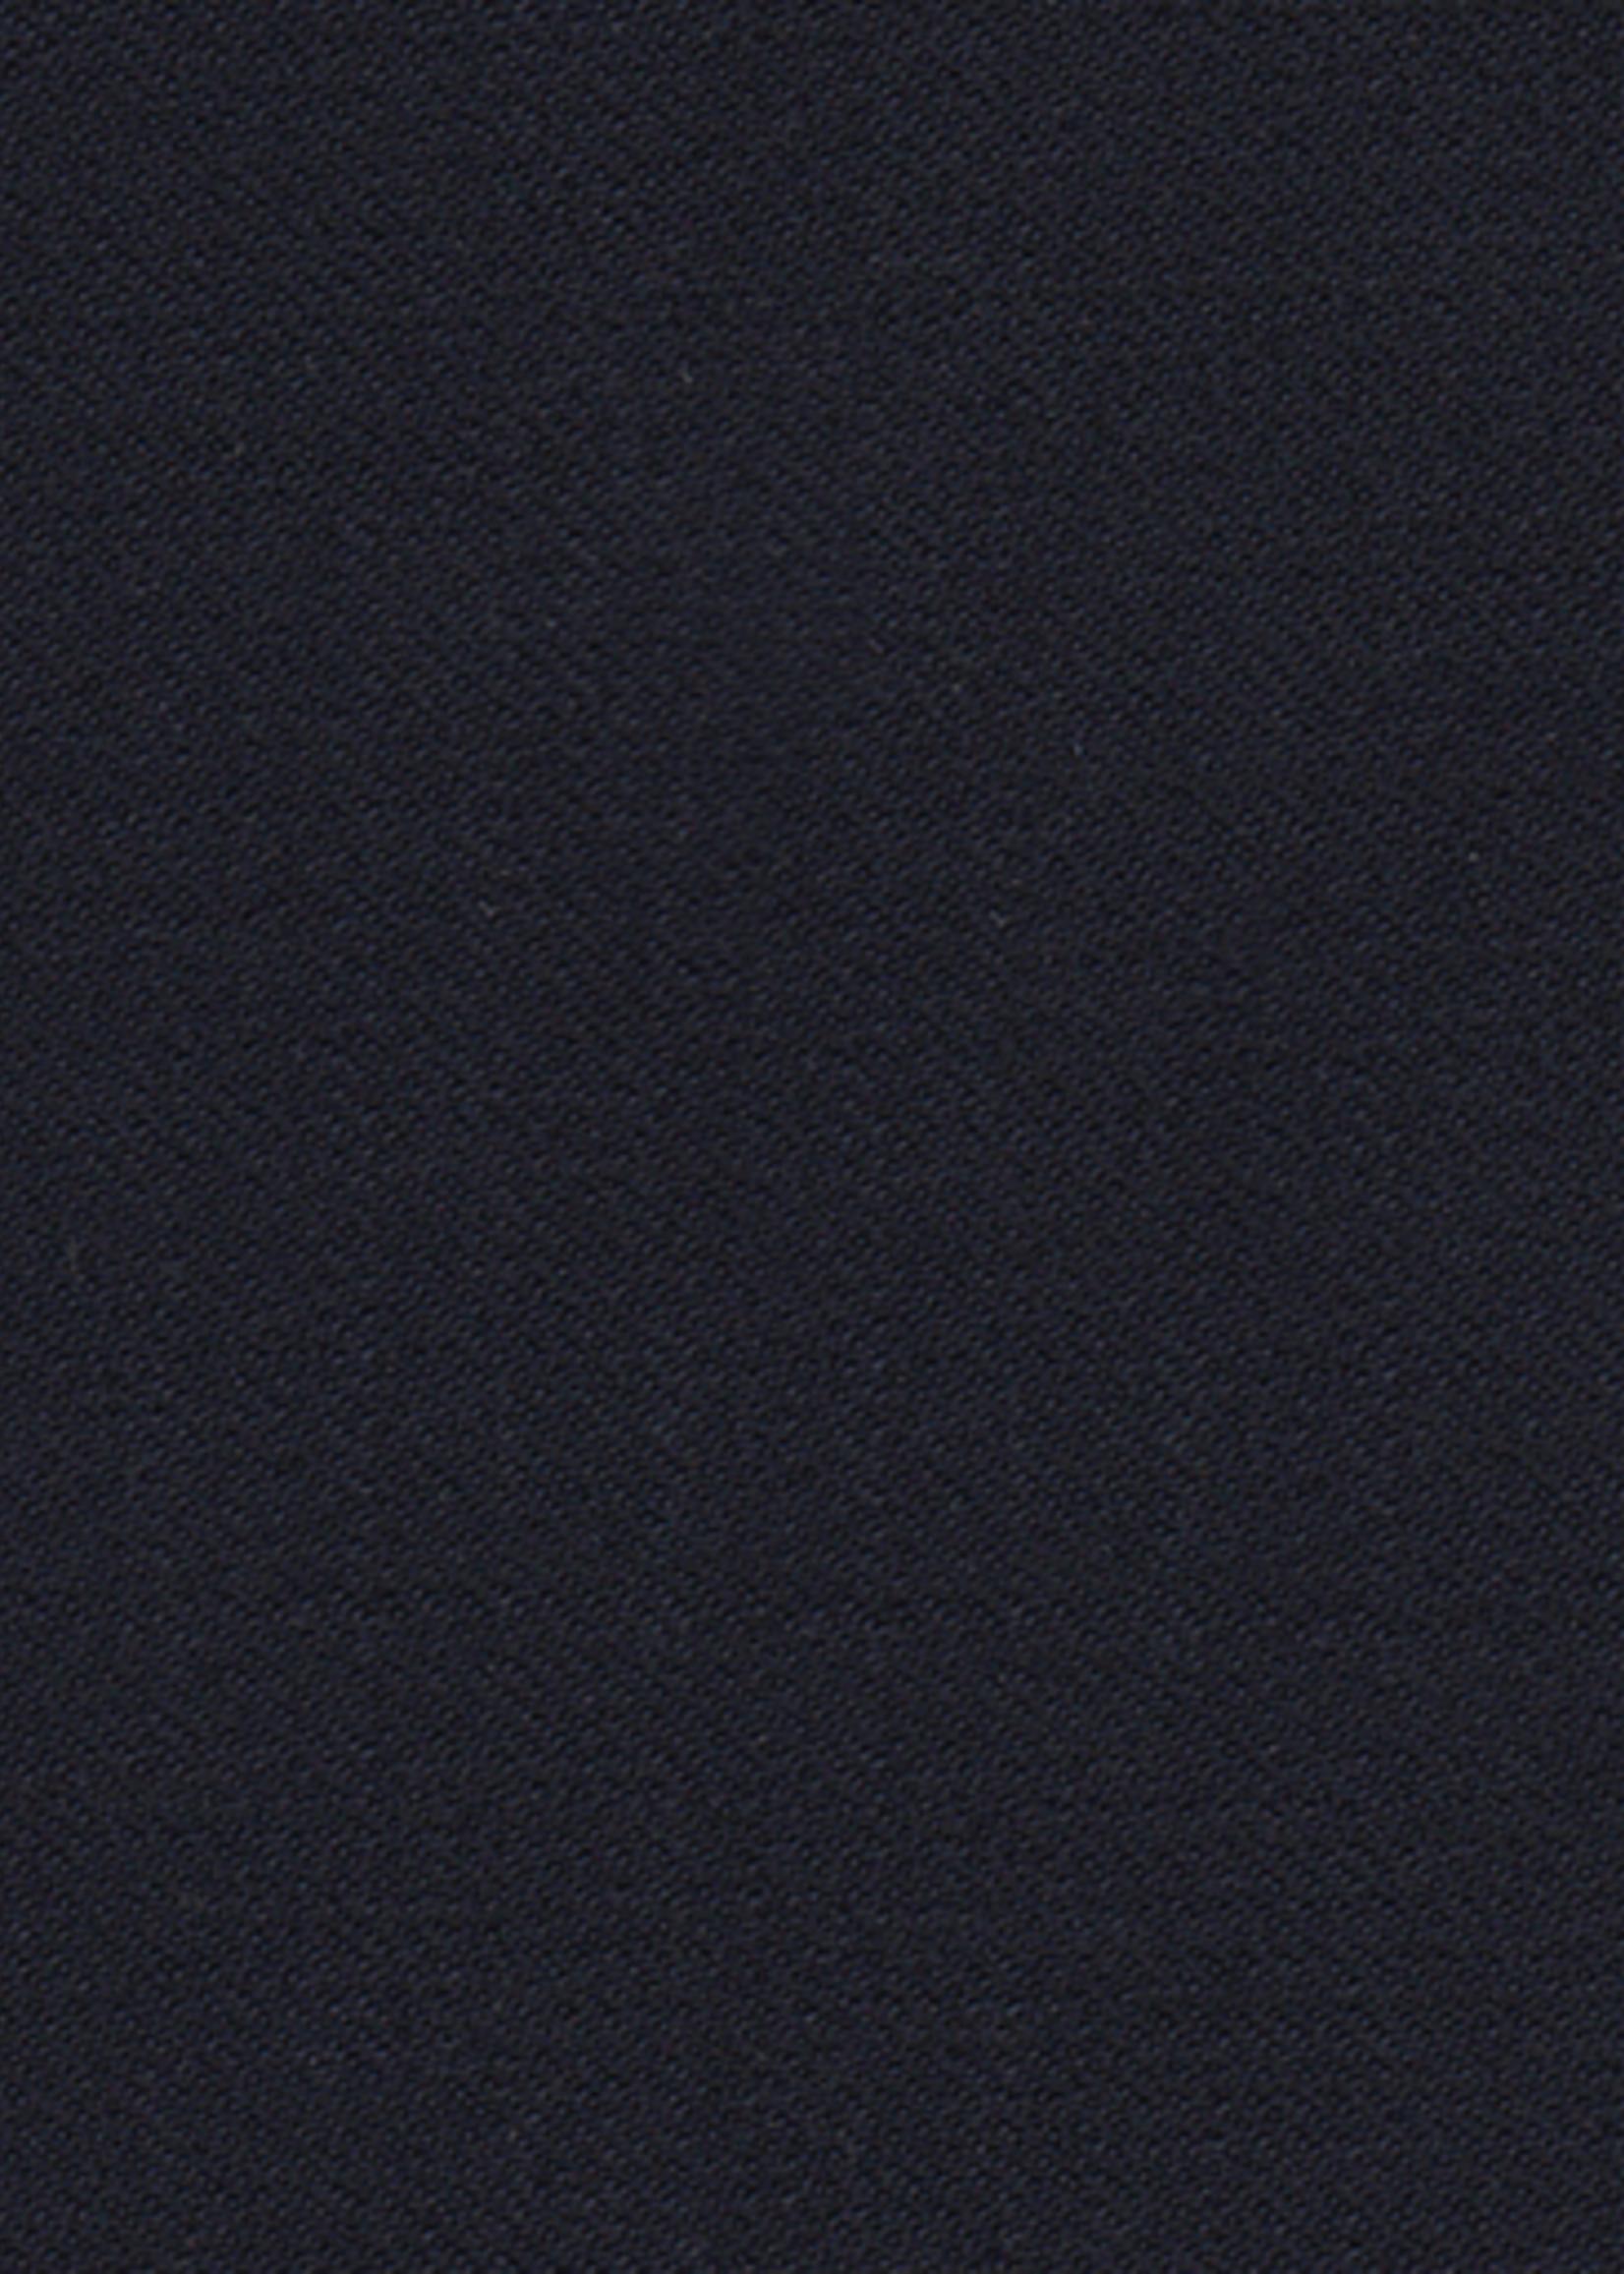 Samuelsohn Colombo 150's Ice Wool Suit Navy by Samuelsohn